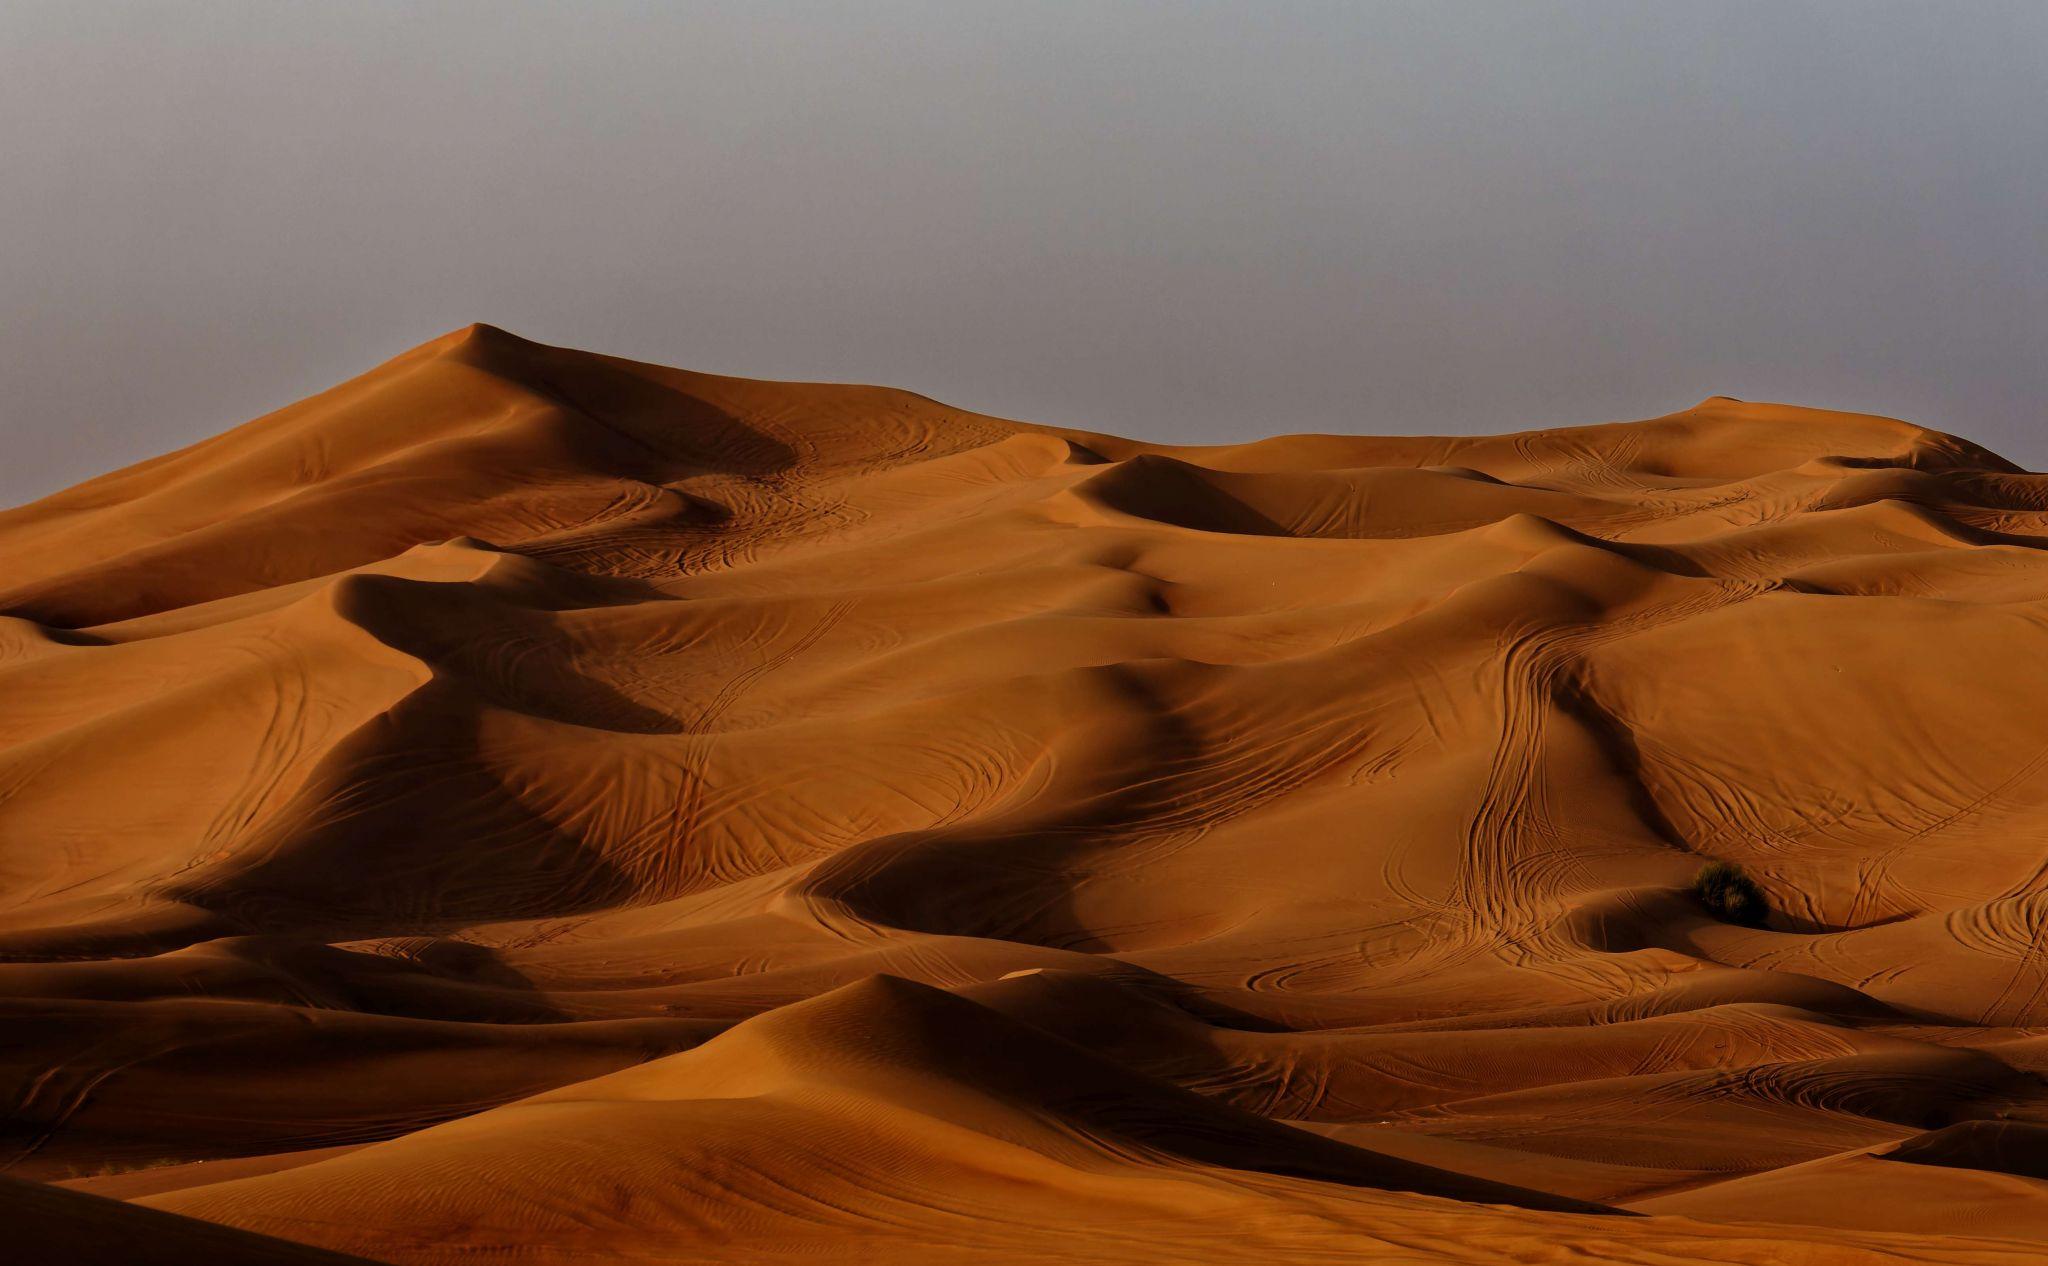 Al Madam - Schardscha, United Arab Emirates